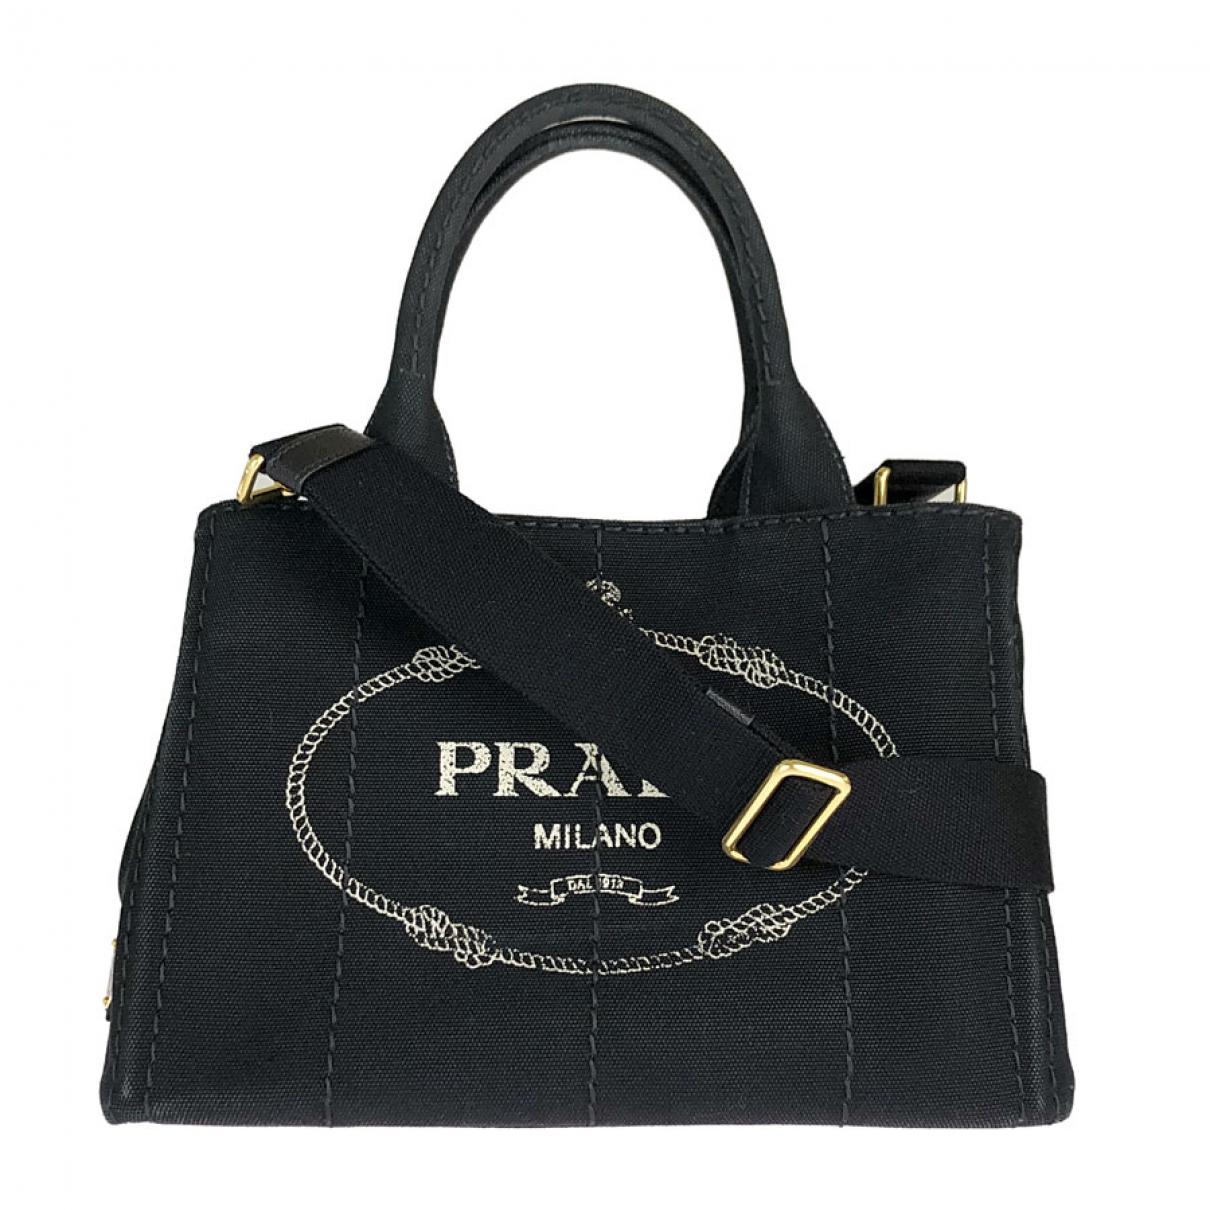 Prada - Sac a main   pour femme en toile - noir